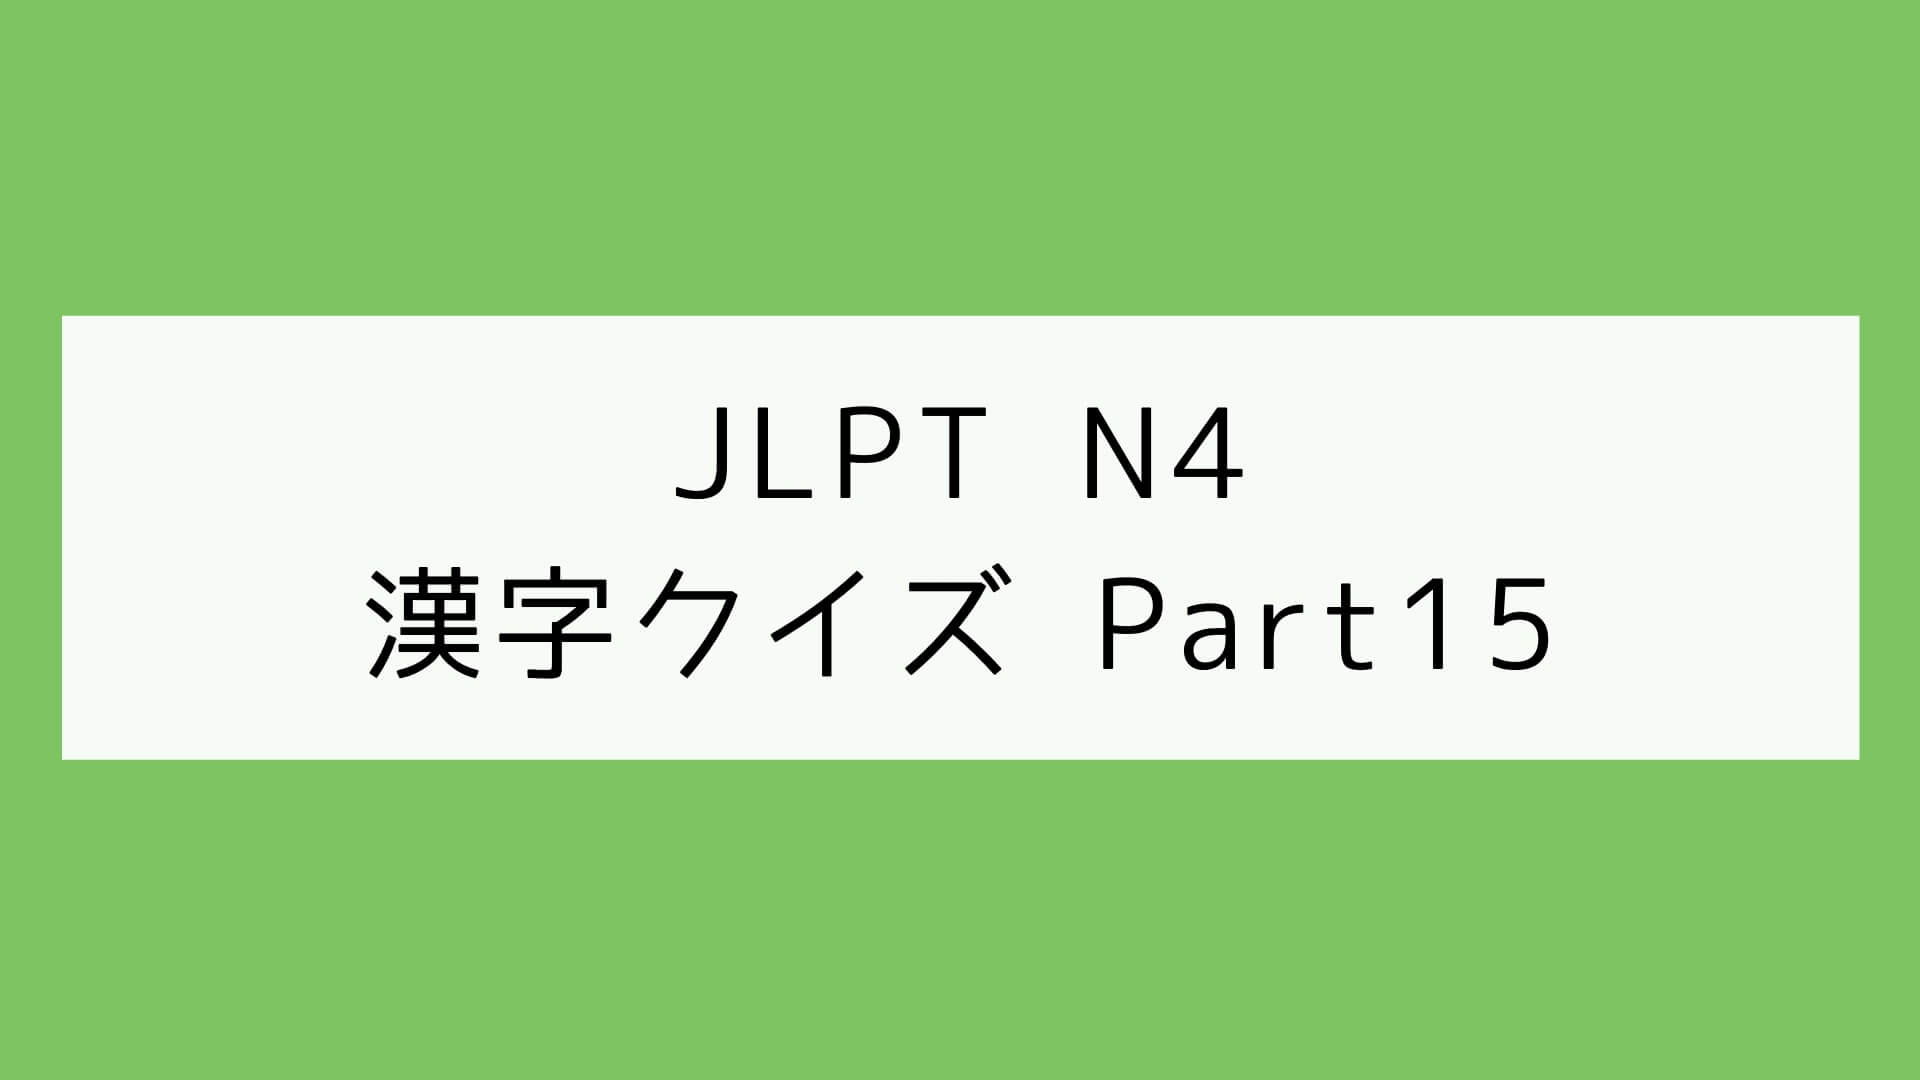 【JLPT N4】漢字クイズ Part15